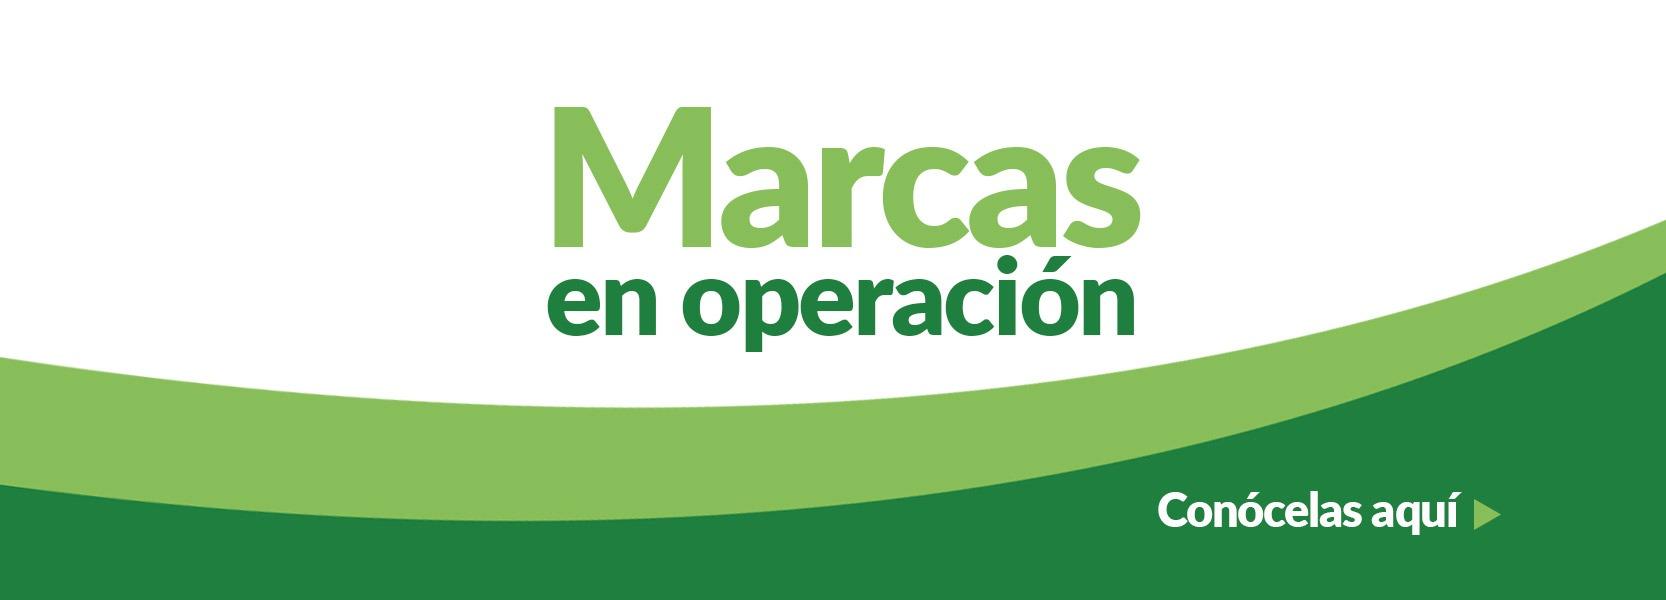 MARCAS-EN-OPERACIÓN